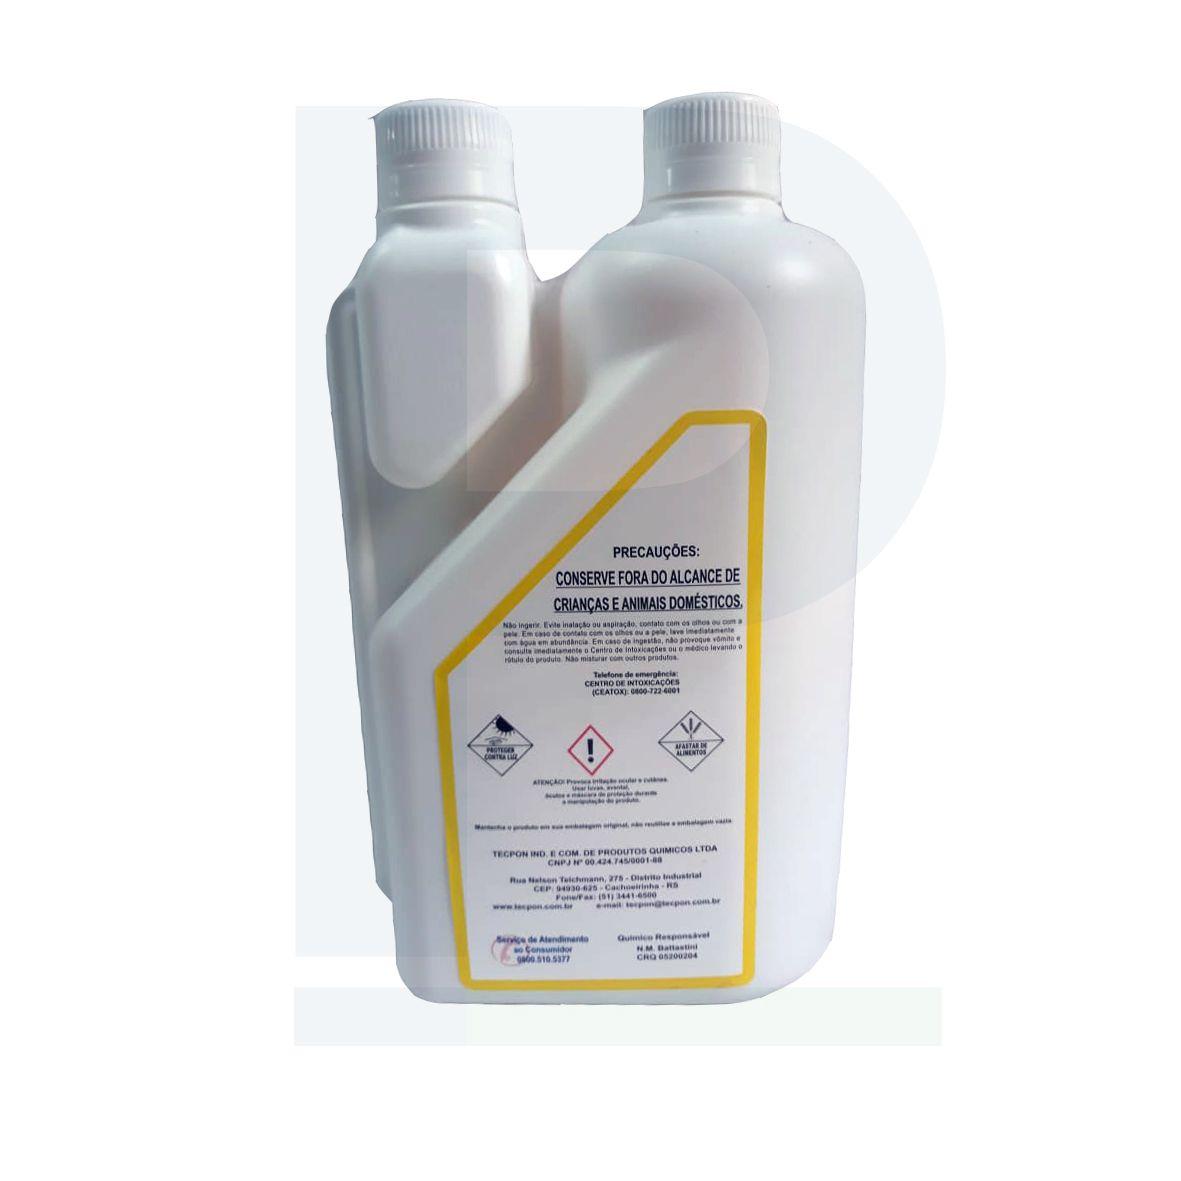 Detergente Enzimático Enzitec 5 enzimas-1 litros